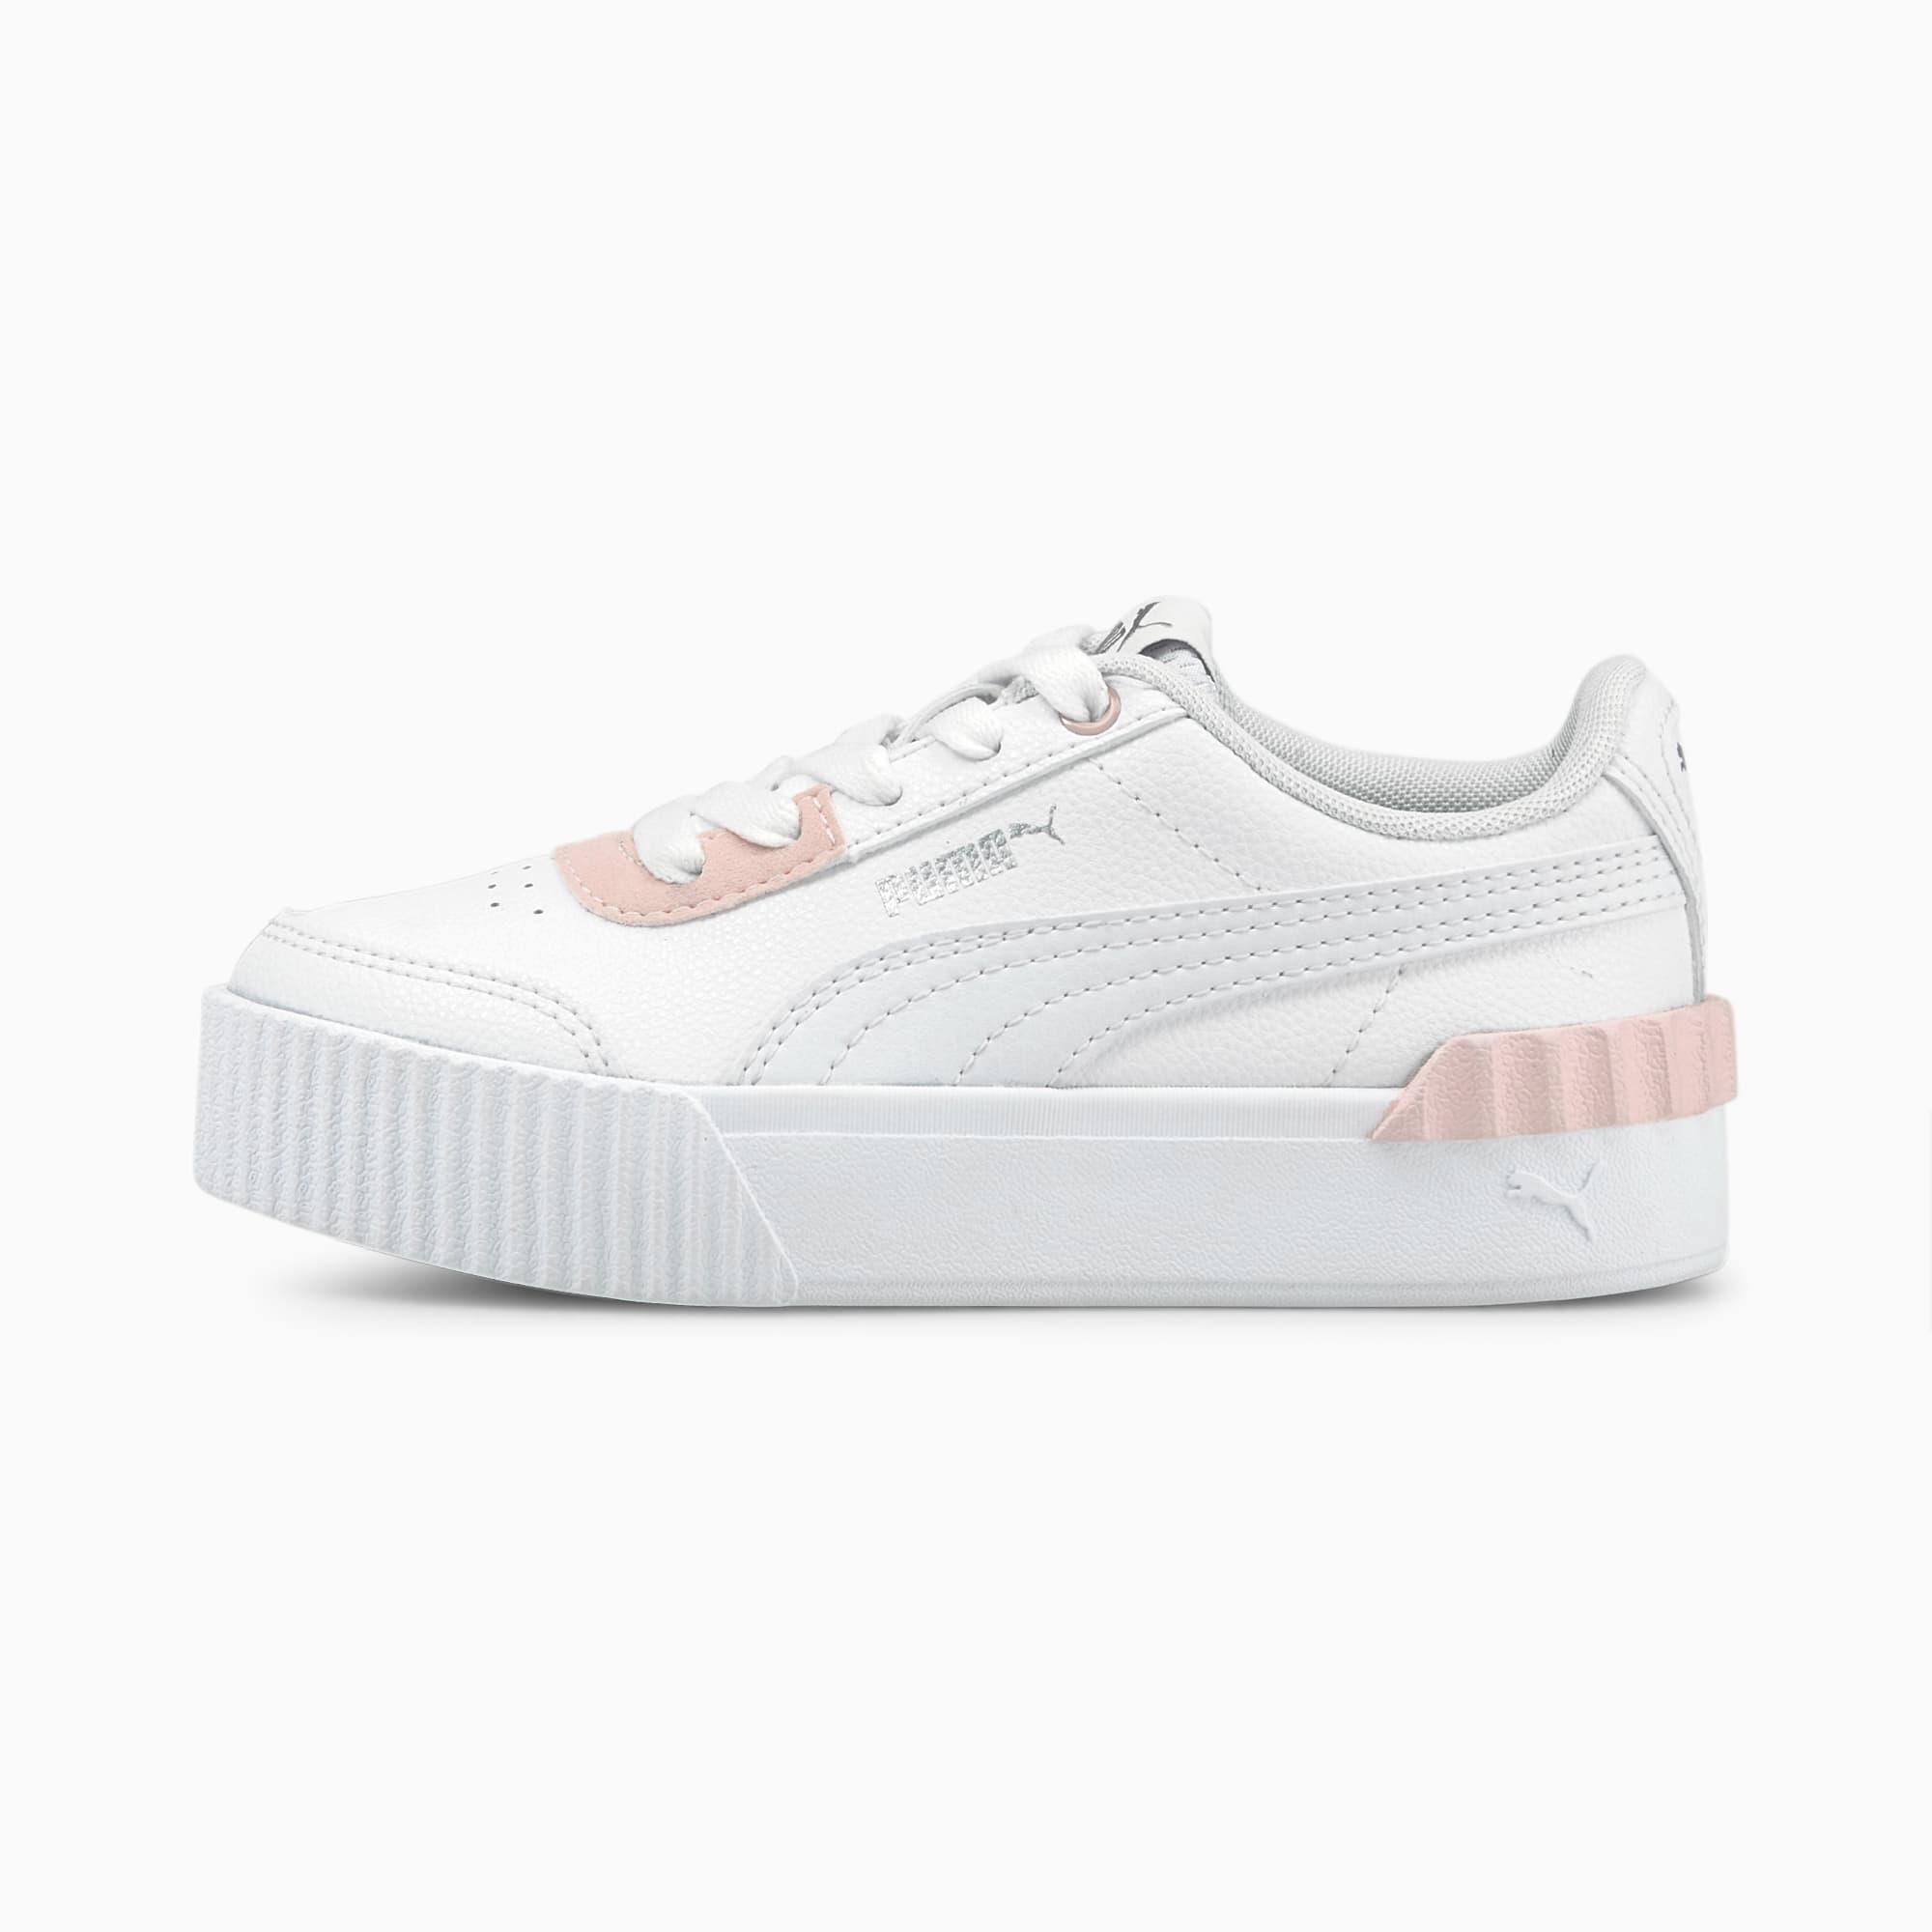 Carina Lift Little Kids' Sneakers